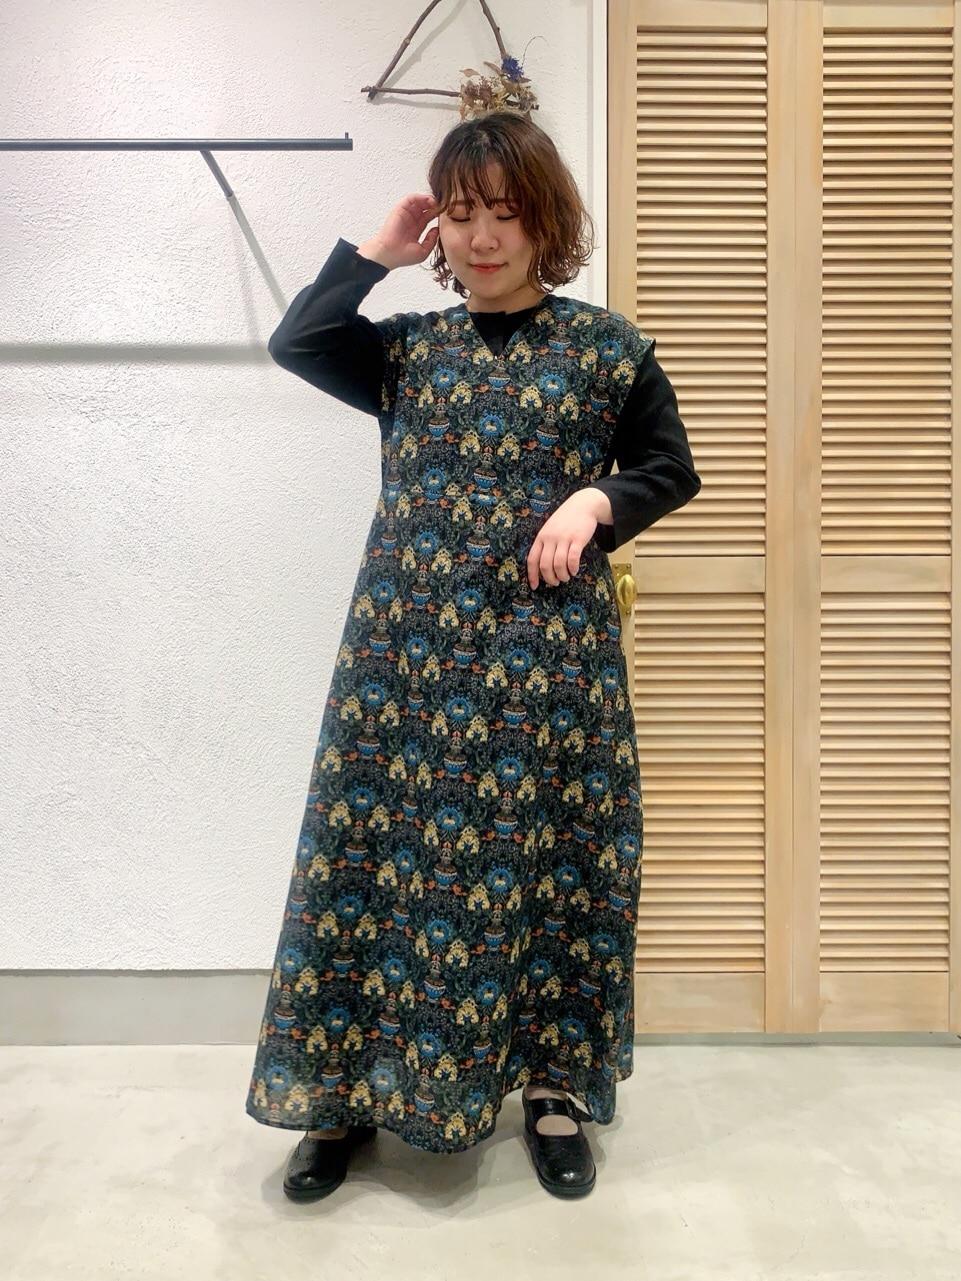 chambre de charme 横浜ジョイナス 身長:155cm 2021.04.17